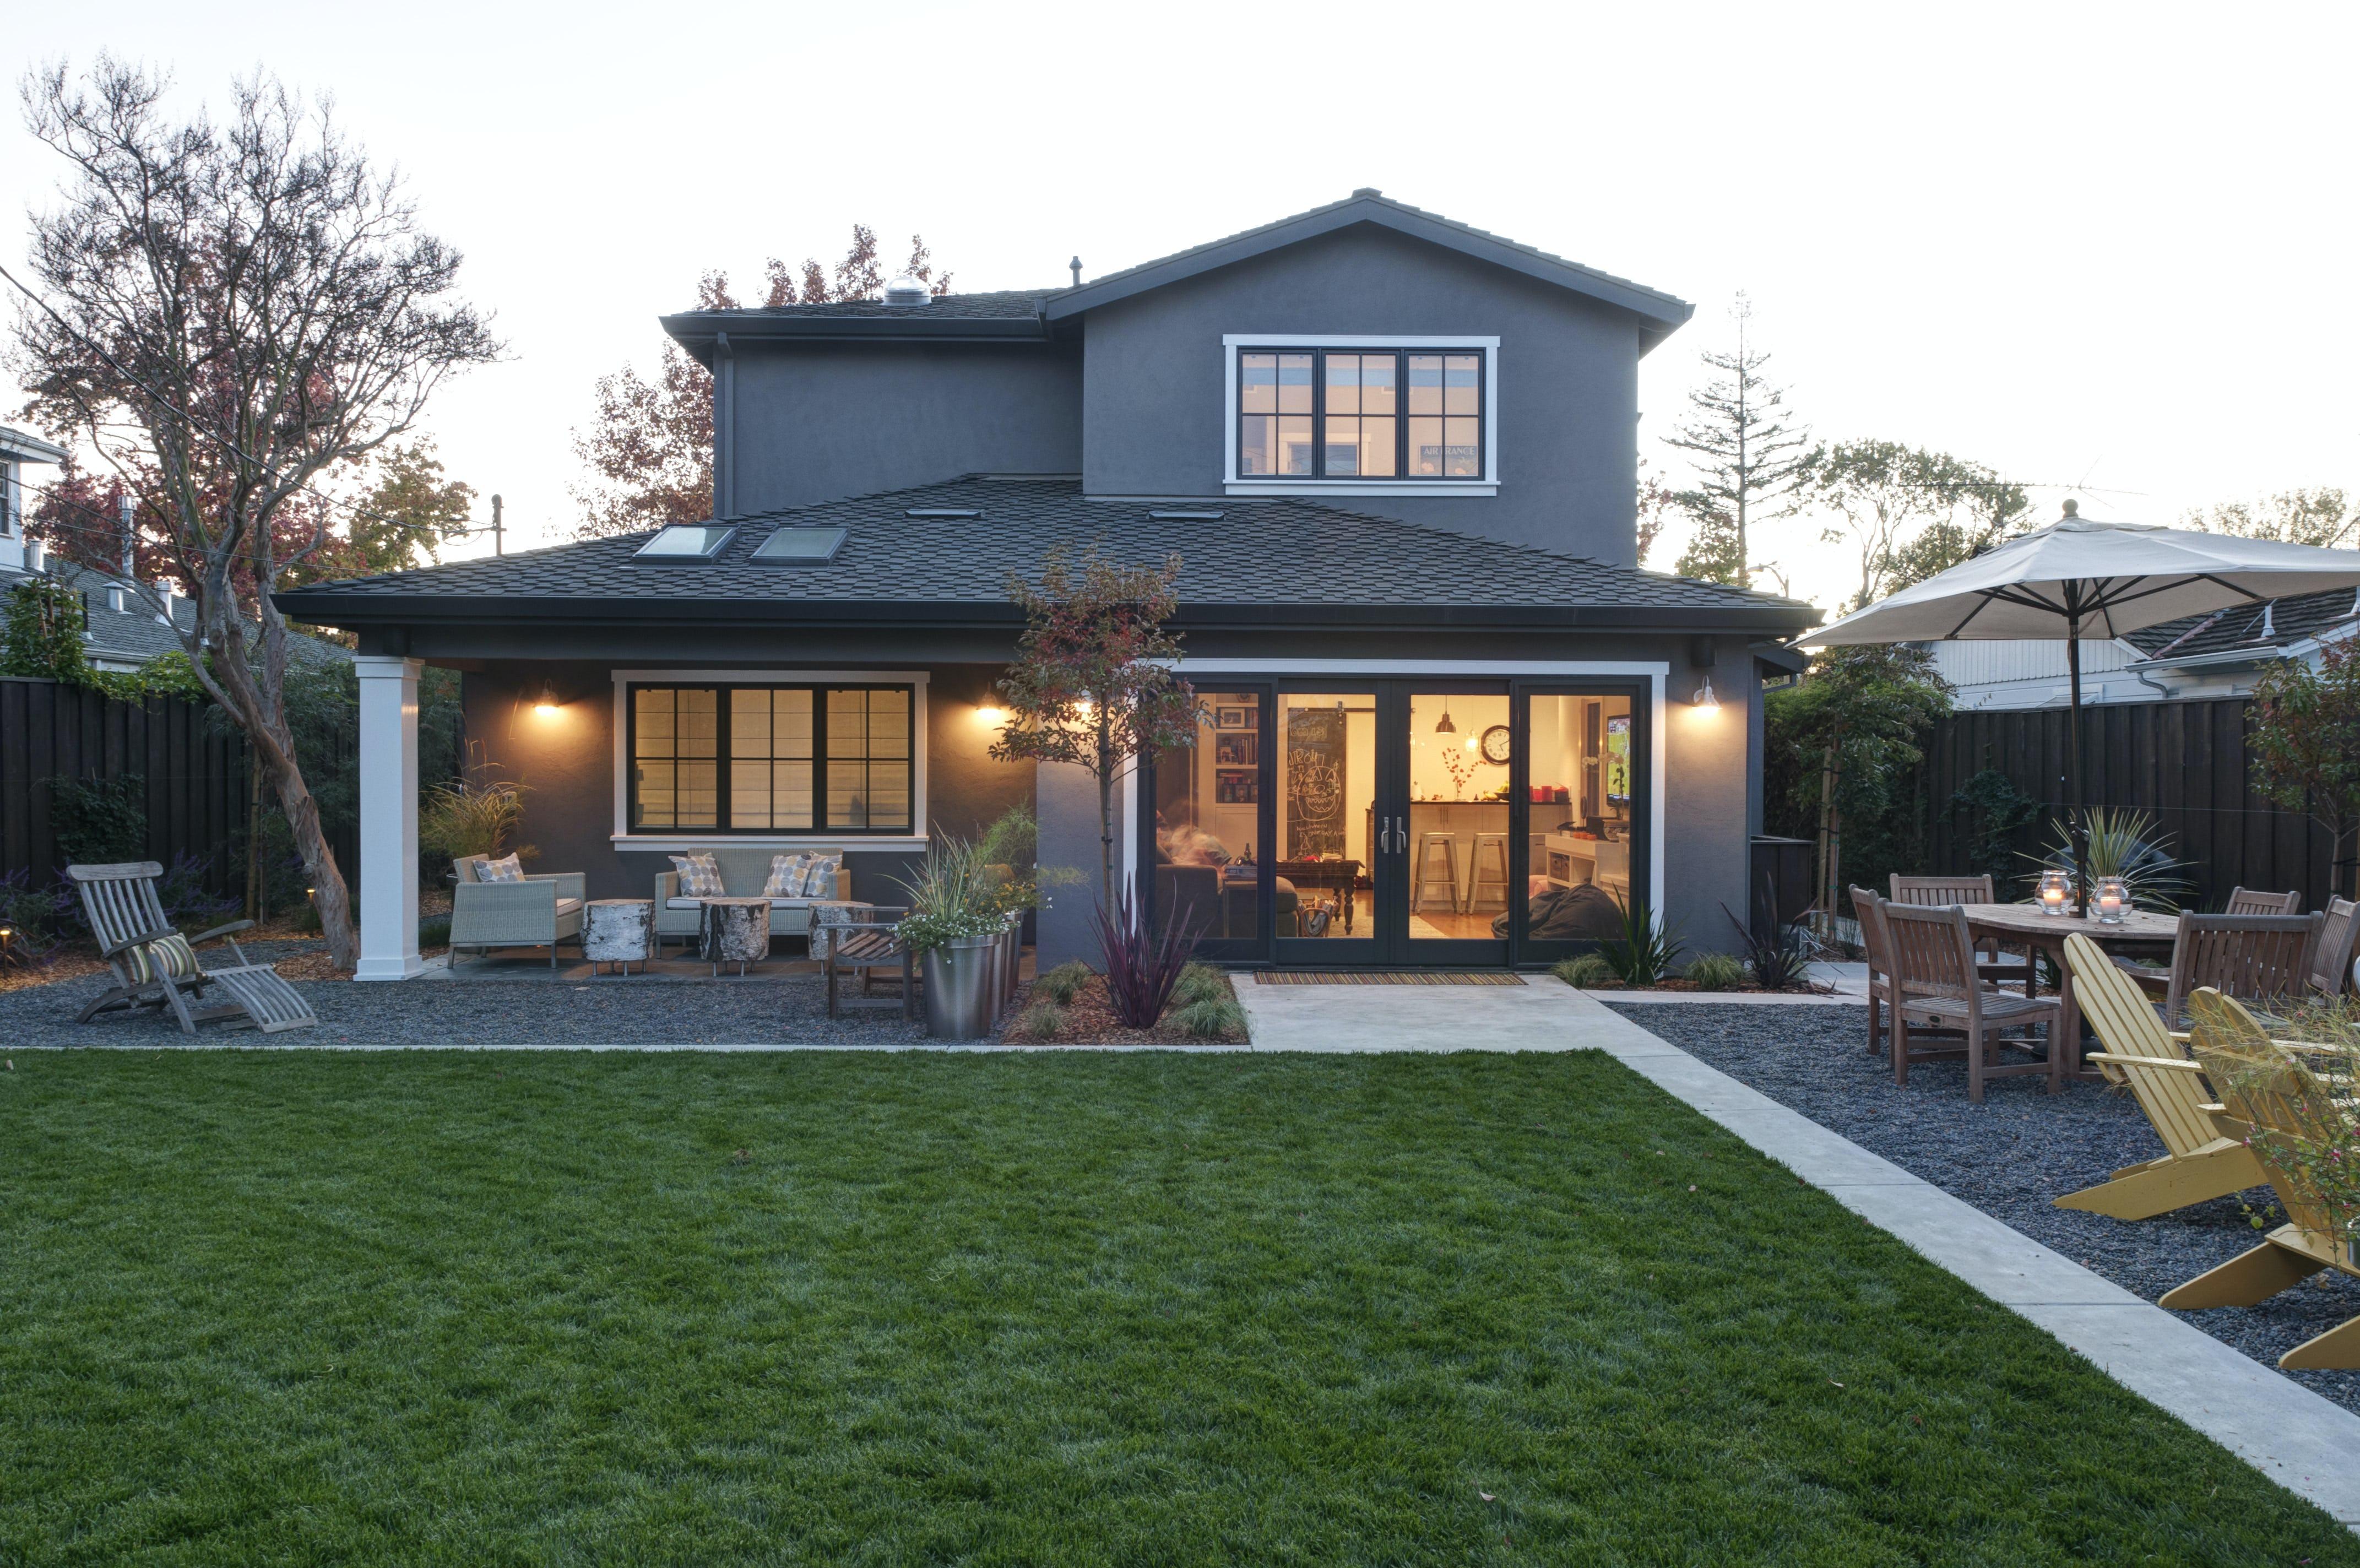 Studio karliova south court remodel interior design architecture exterior backyard 2